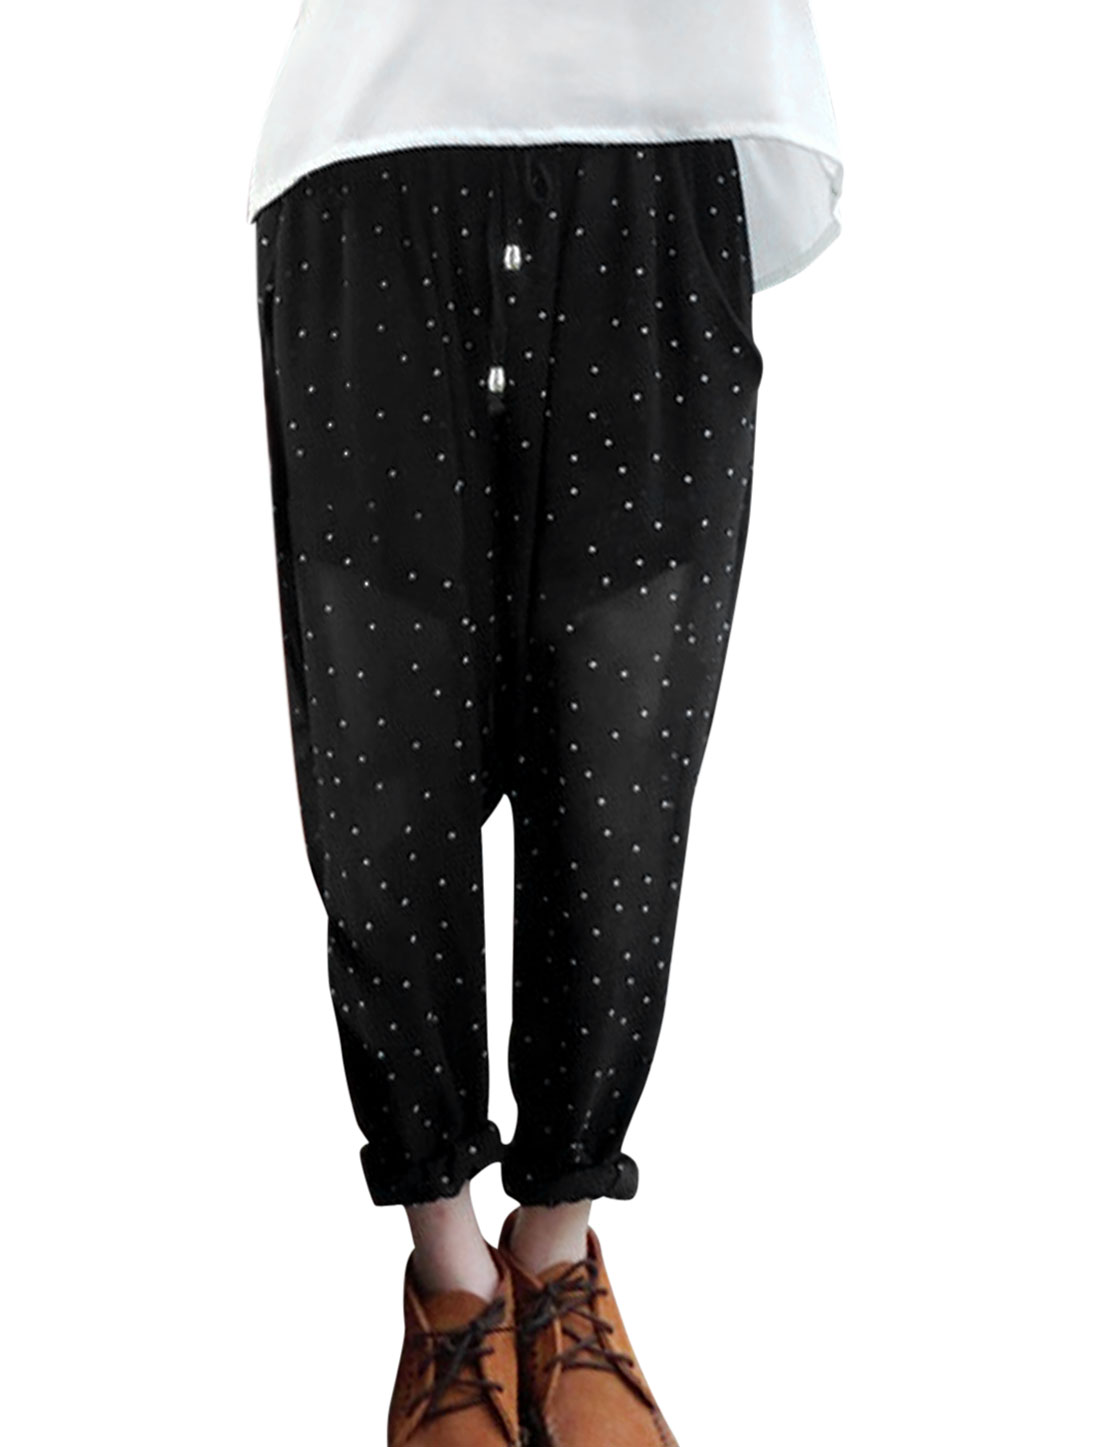 Lady's Elastic Waist Dots Pattern Lining Black XS Chiffon Harem Pants